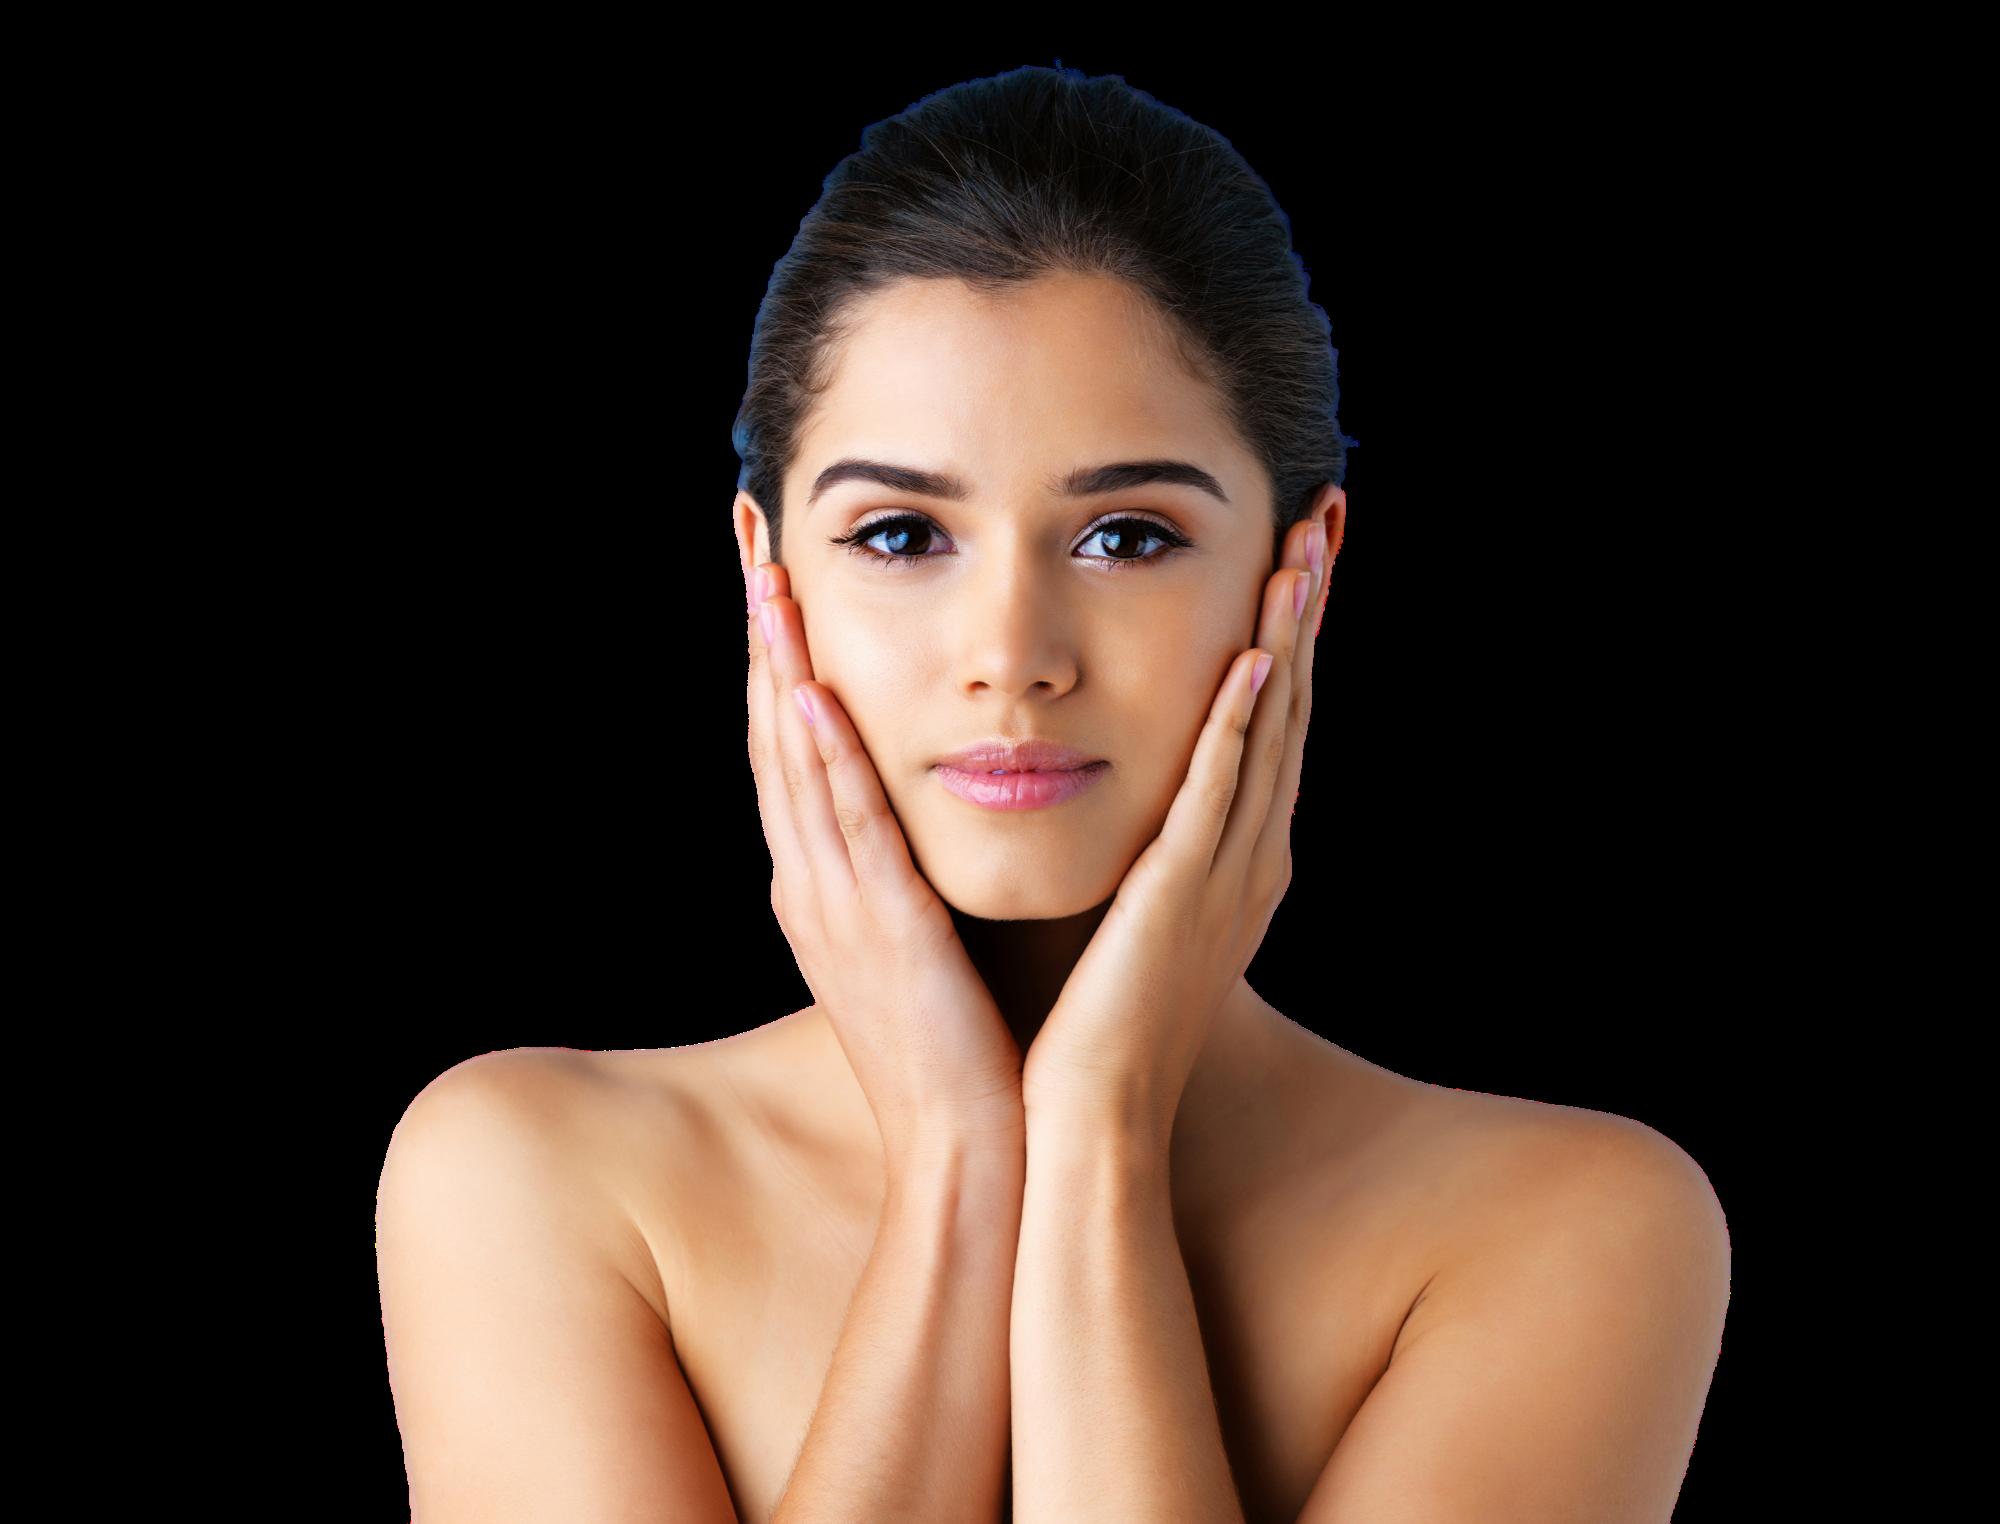 ArtfulSurgery Skin Procedures